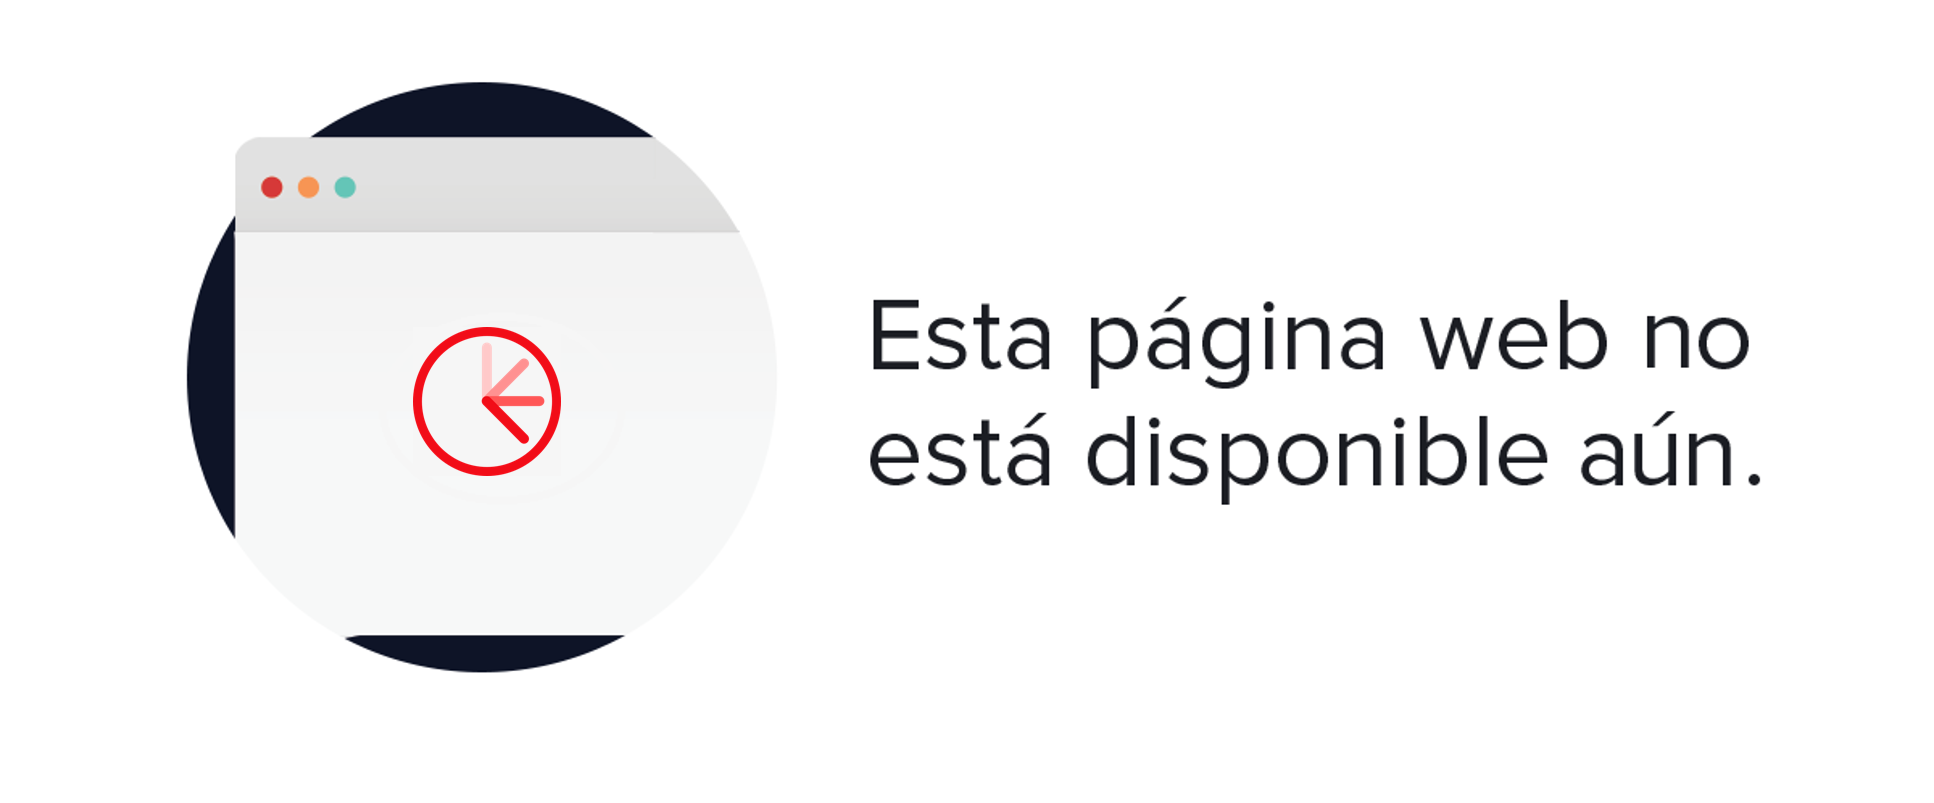 1c5b96992f1 Polo Ralph Lauren - Chaqueta de pana de mujer Polo Ralph Lauren en marrón  claro Marrón claro 001014966294127002 - CDCMVVV